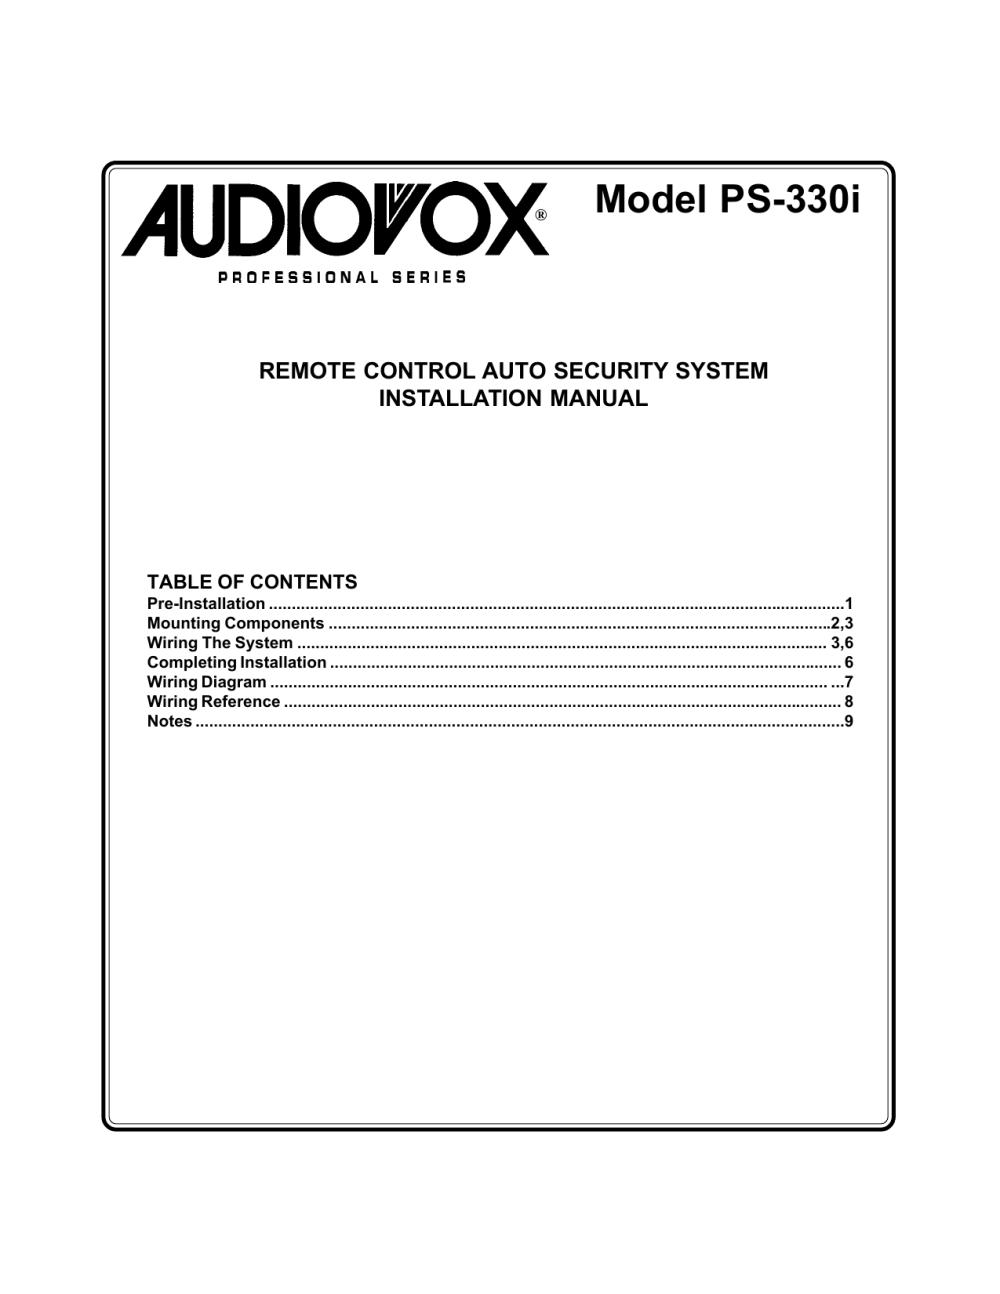 medium resolution of audiovox car alarm wiring diagram audiovox image audiovox alarm wiring diagram car audiovox image on audiovox